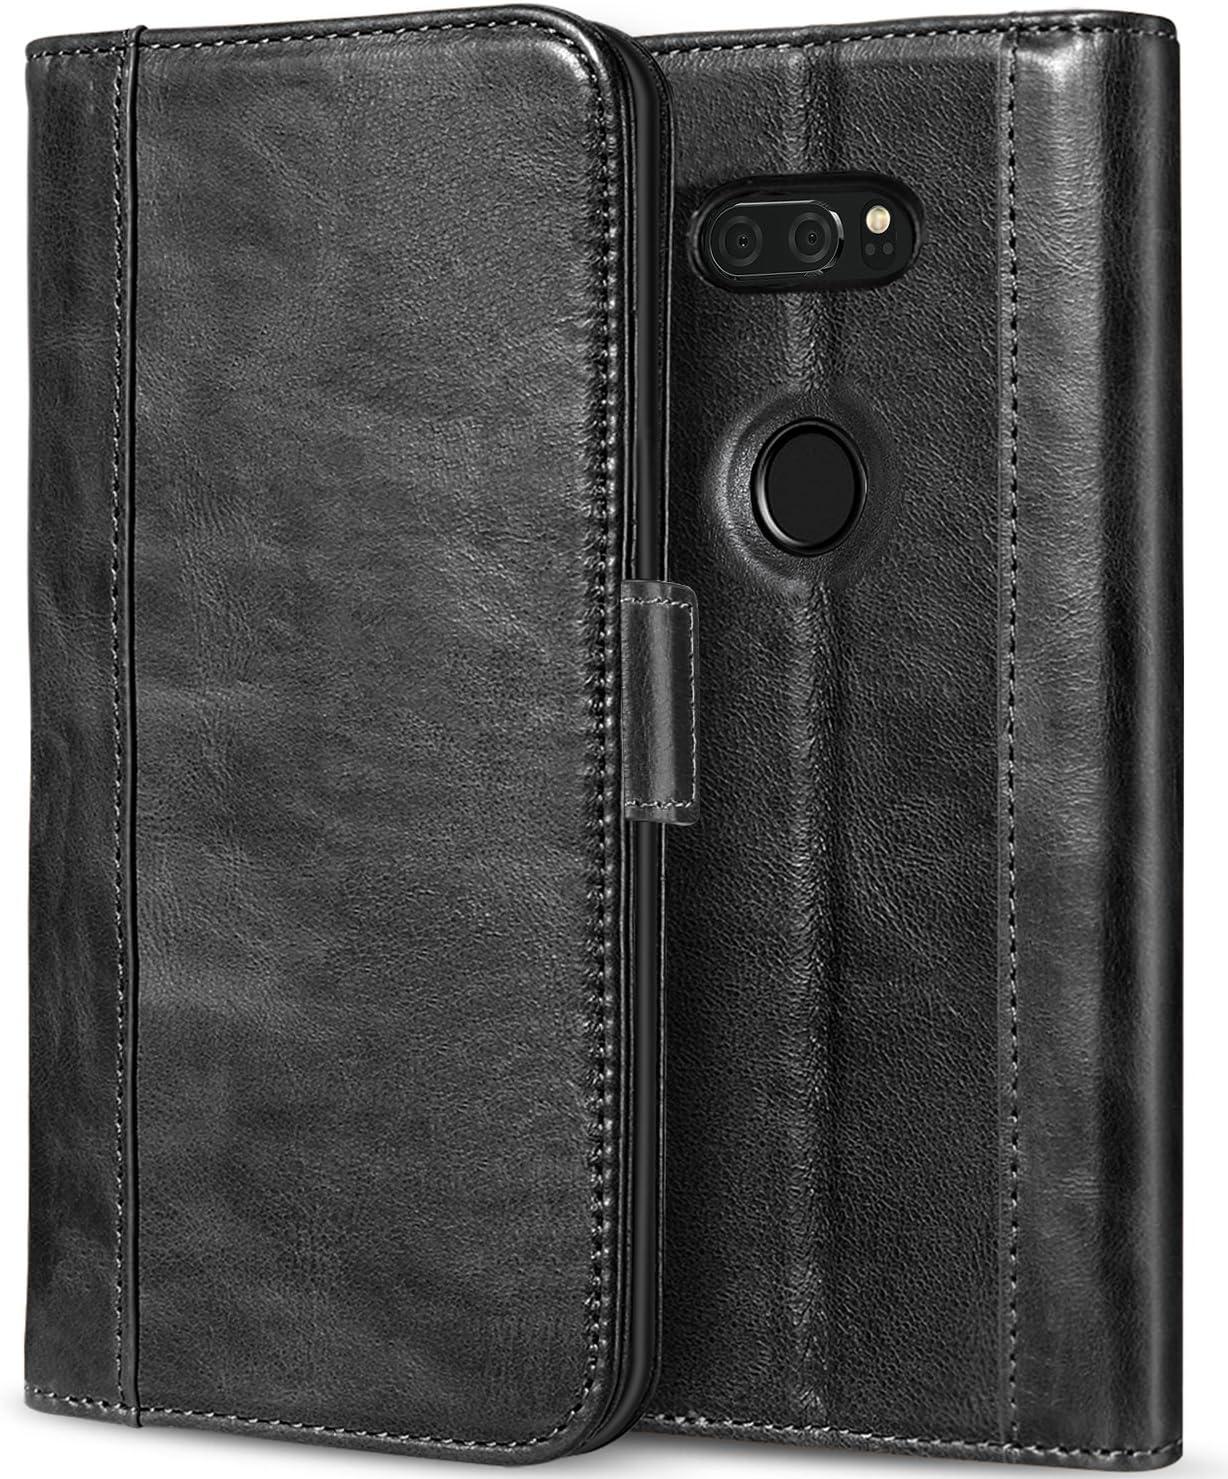 ProCase LG V30 Genuine Leather Case, Vintage Wallet Folding Flip Case with Kickstand Card Holder Protective Cover for LG V30, LG V30 Plus, LG V30S ThinQ, LG V35, LG V35 ThinQ -Black